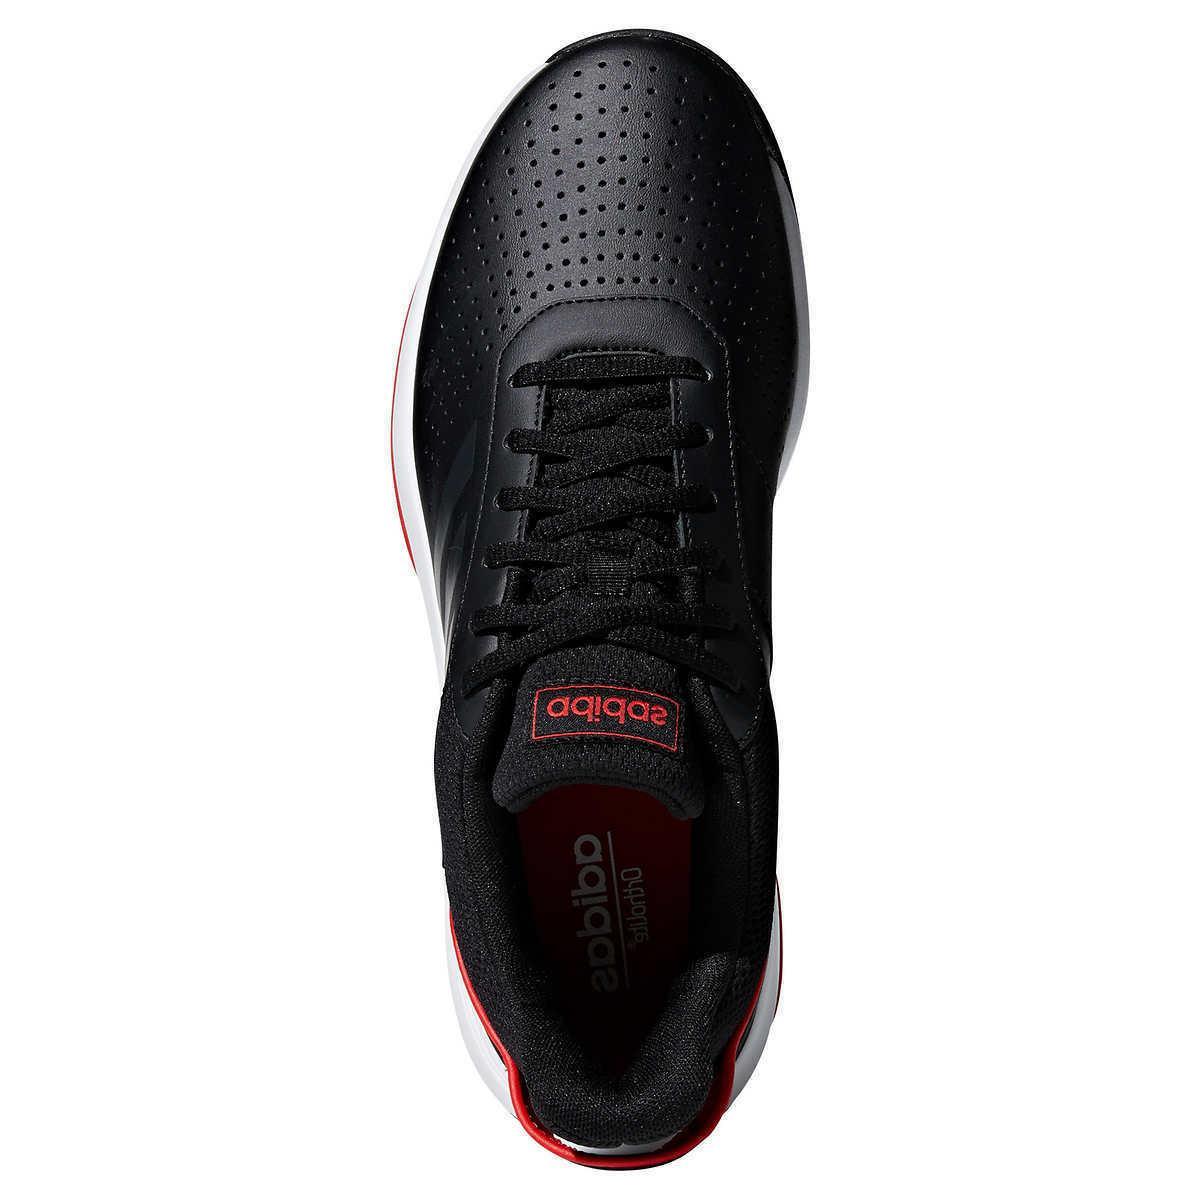 Adidas Men's Black Tennis